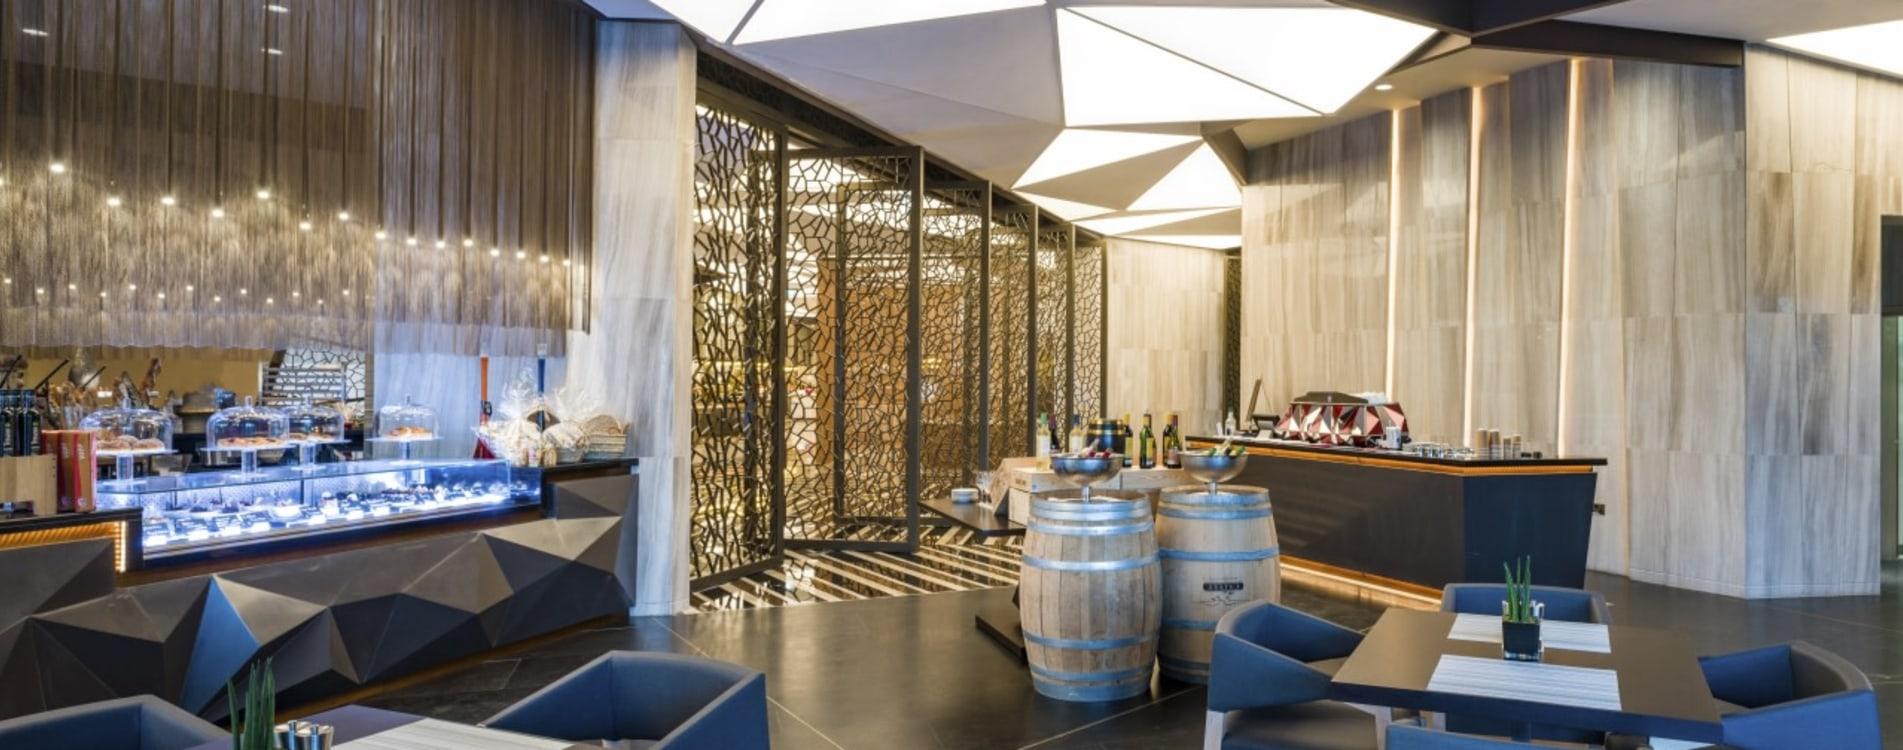 Kempinski-Hotel-Muscat-Cafe-One-Eingang-Oman.jpg